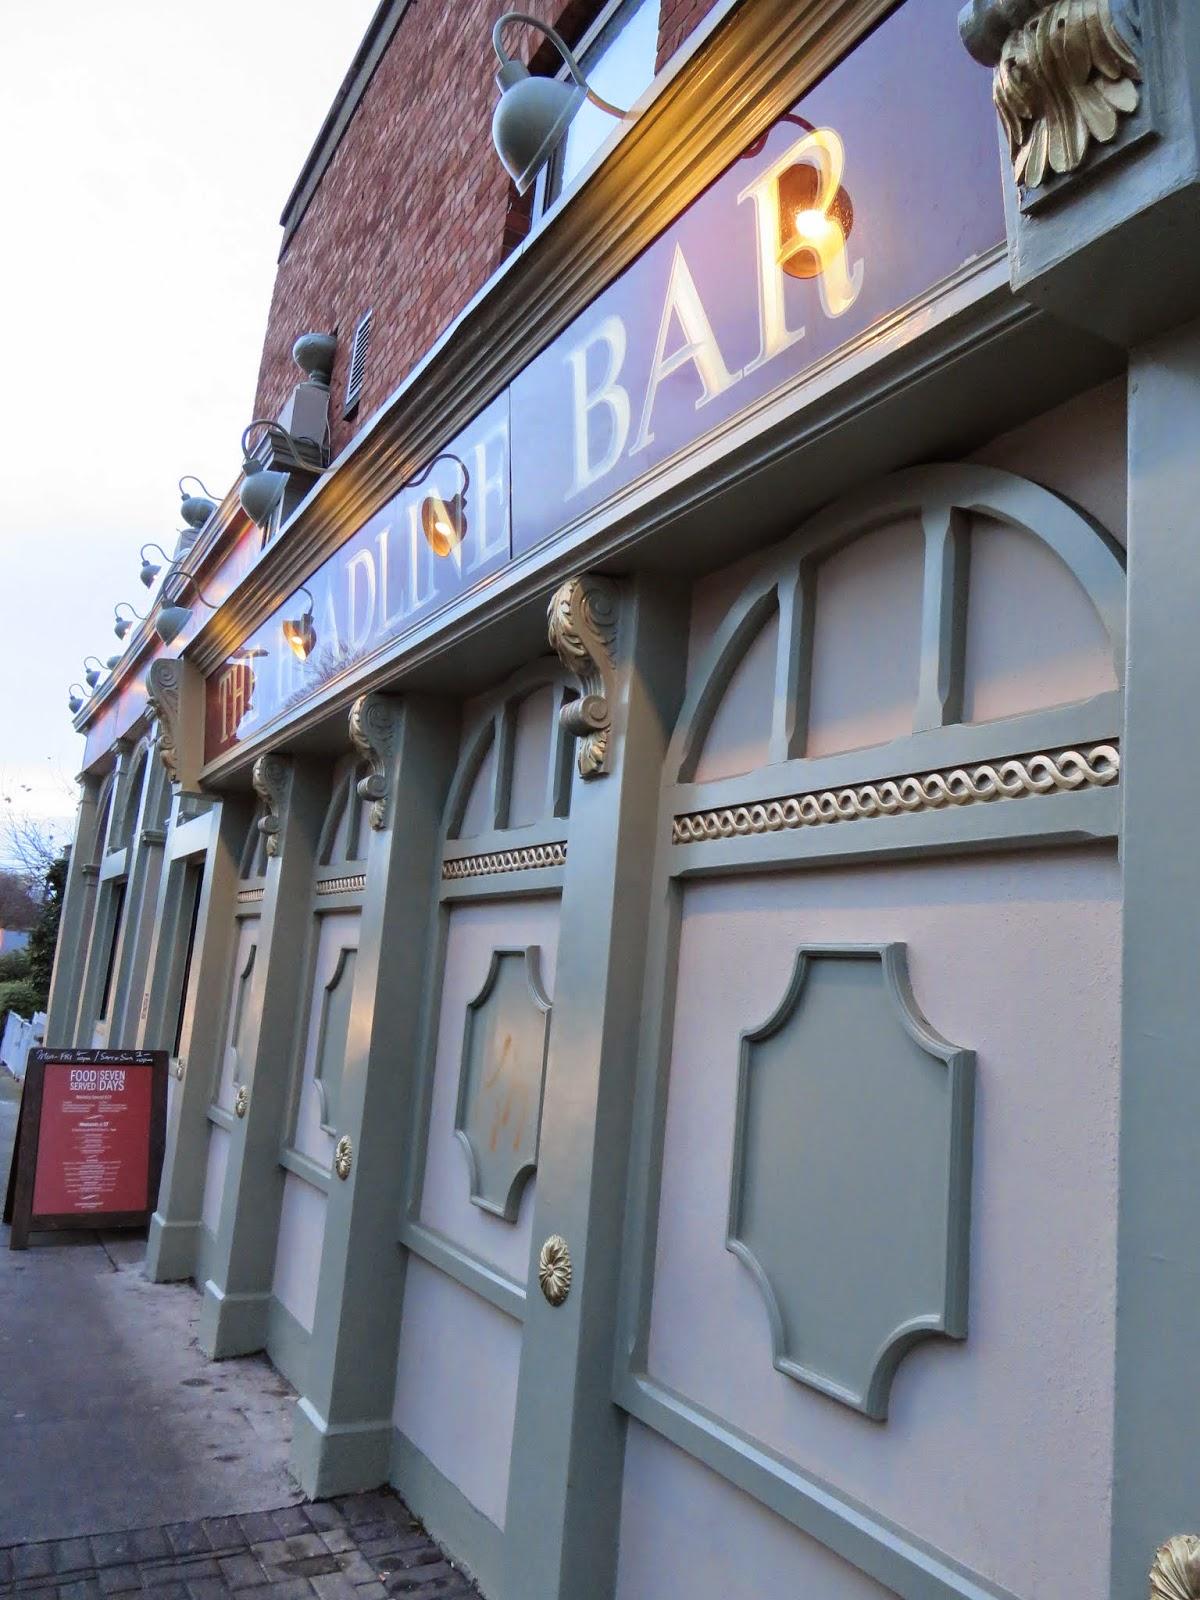 57 The Headline Craft Beer Pub in Dublin